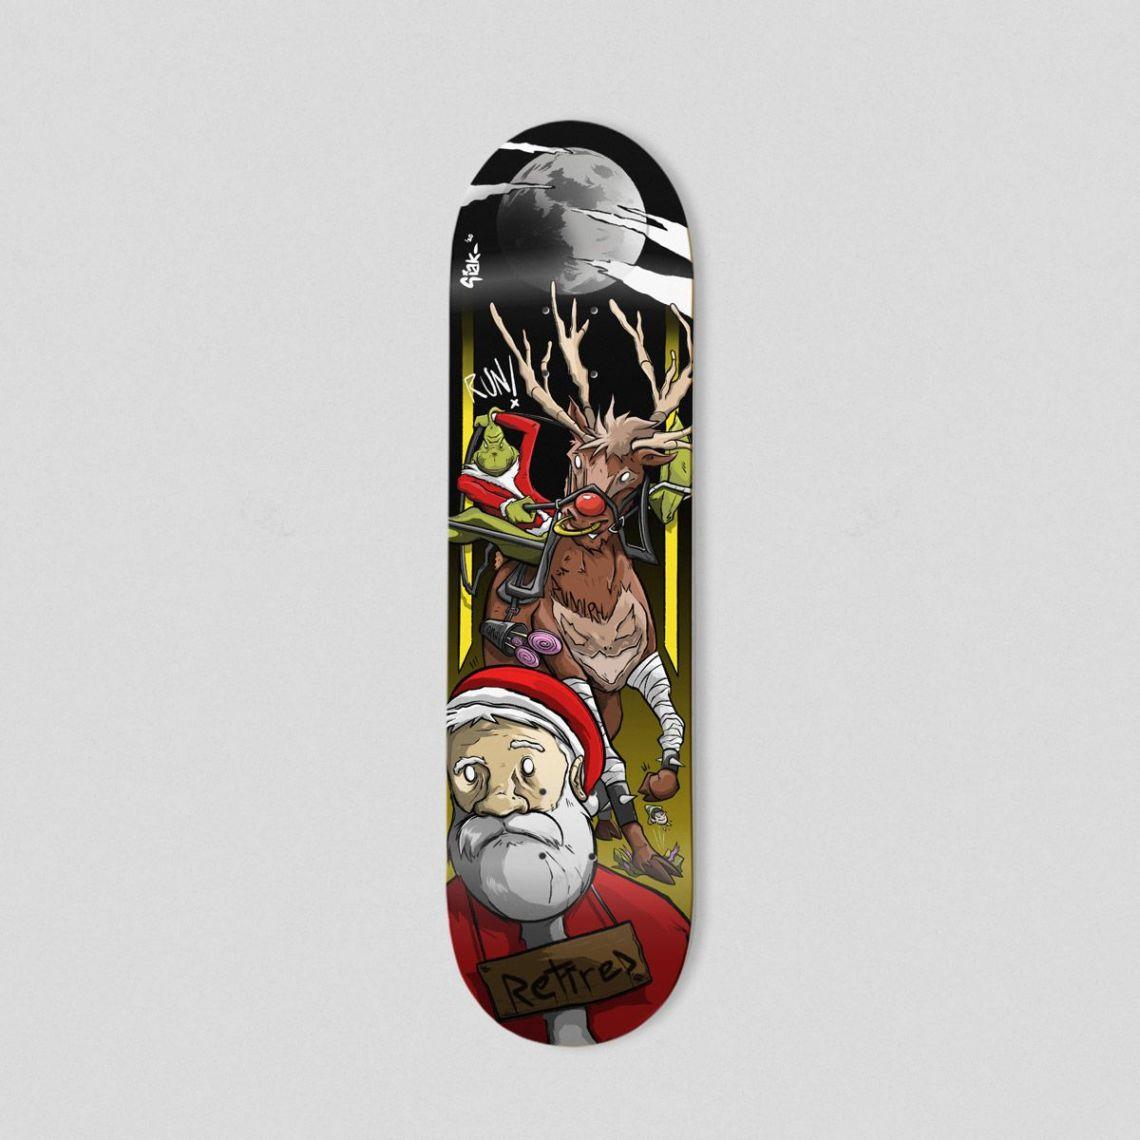 Retired Skateboard By Theevilart X Bonobolabo 2